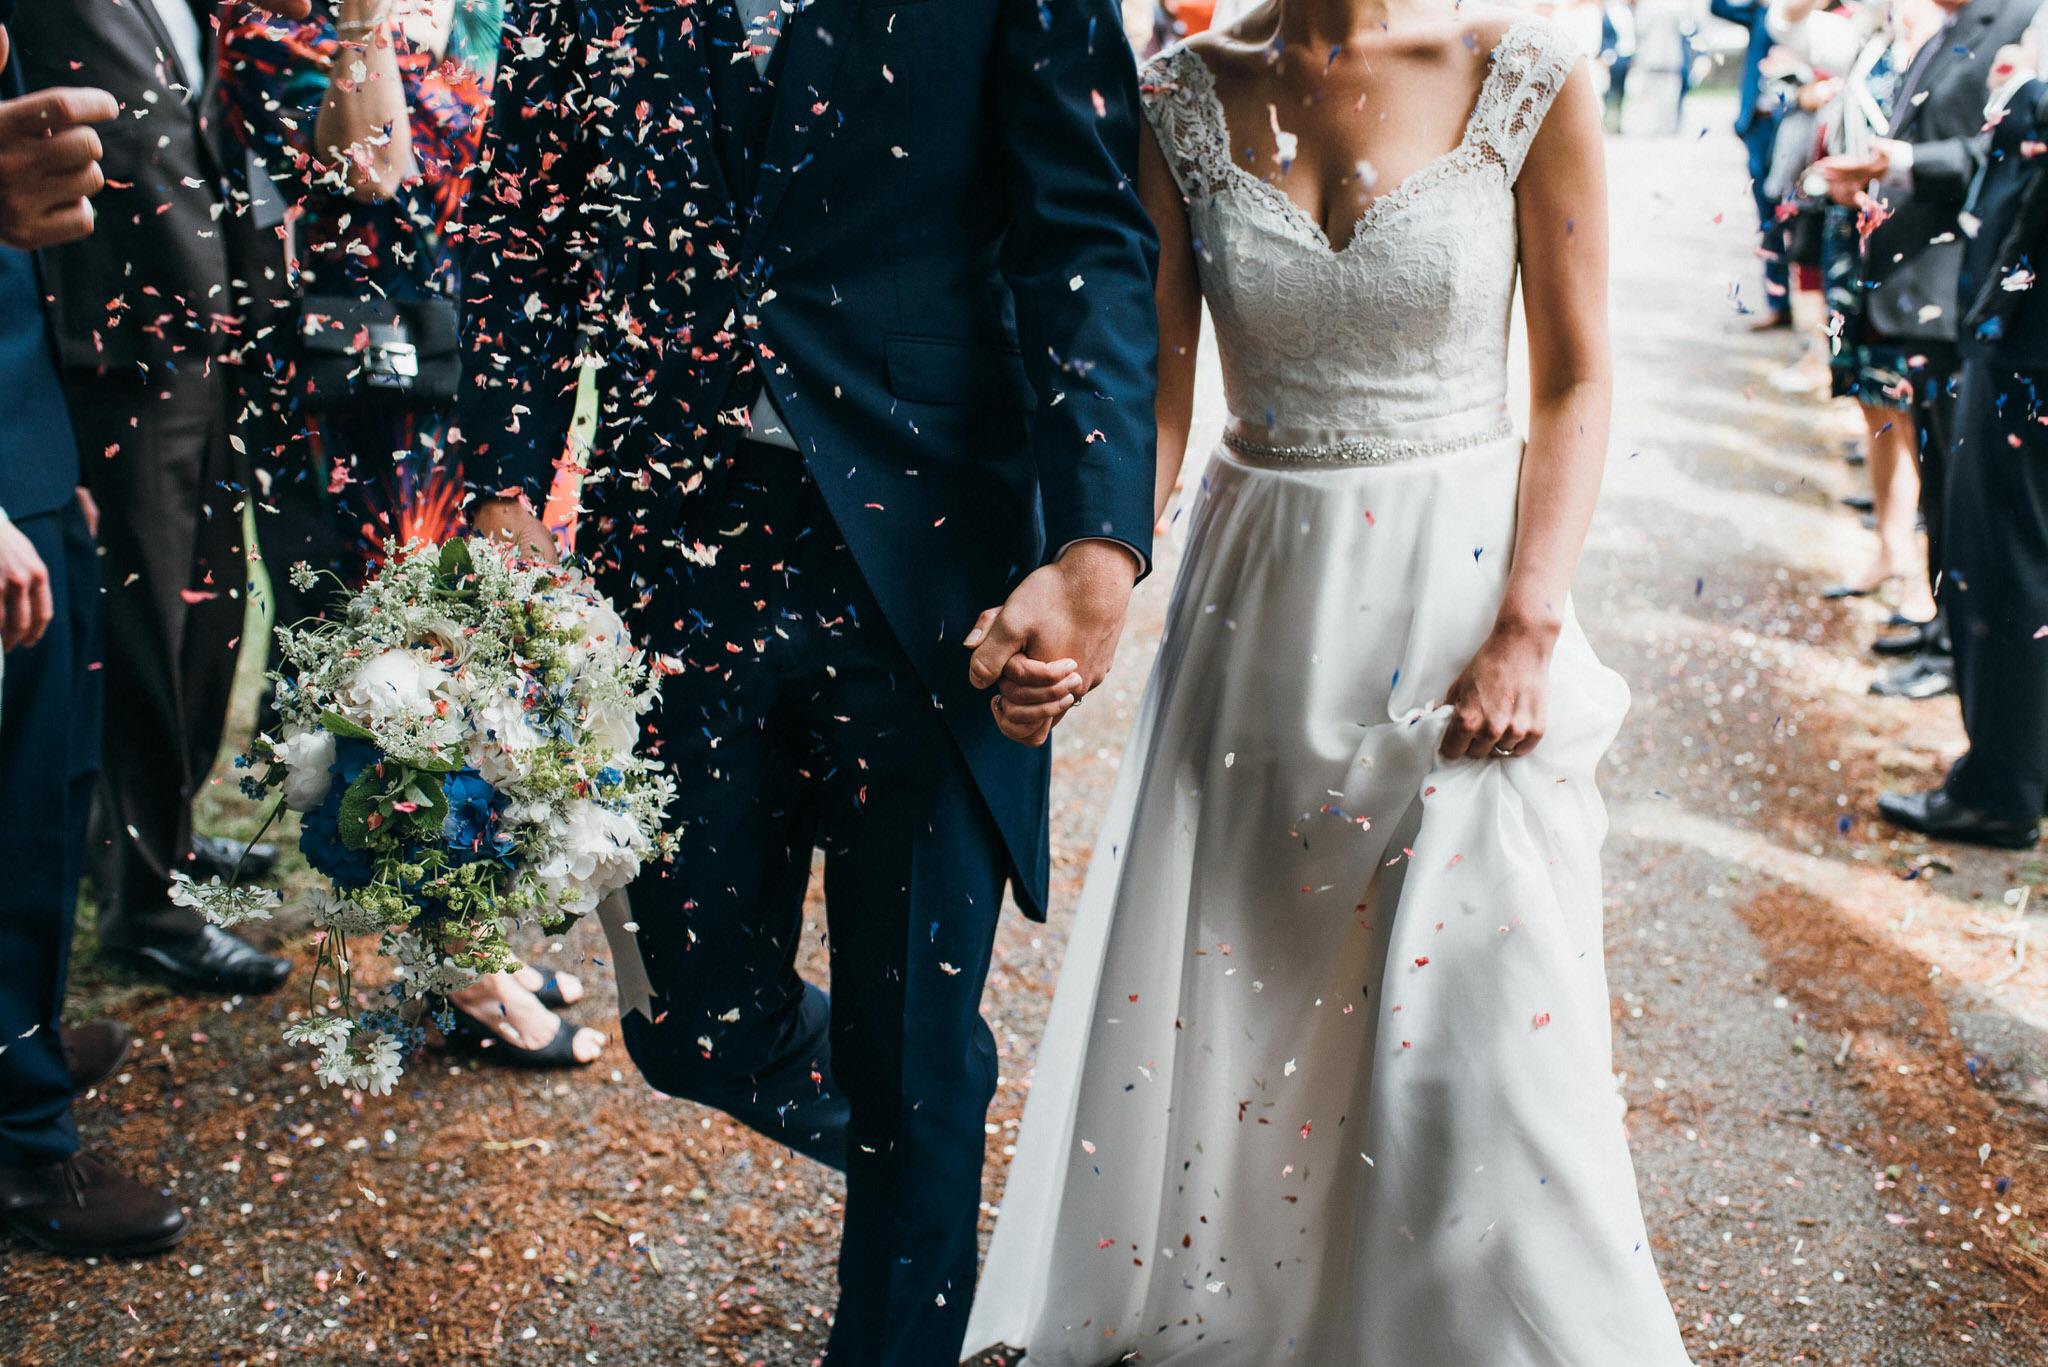 Confetti on bride and groom